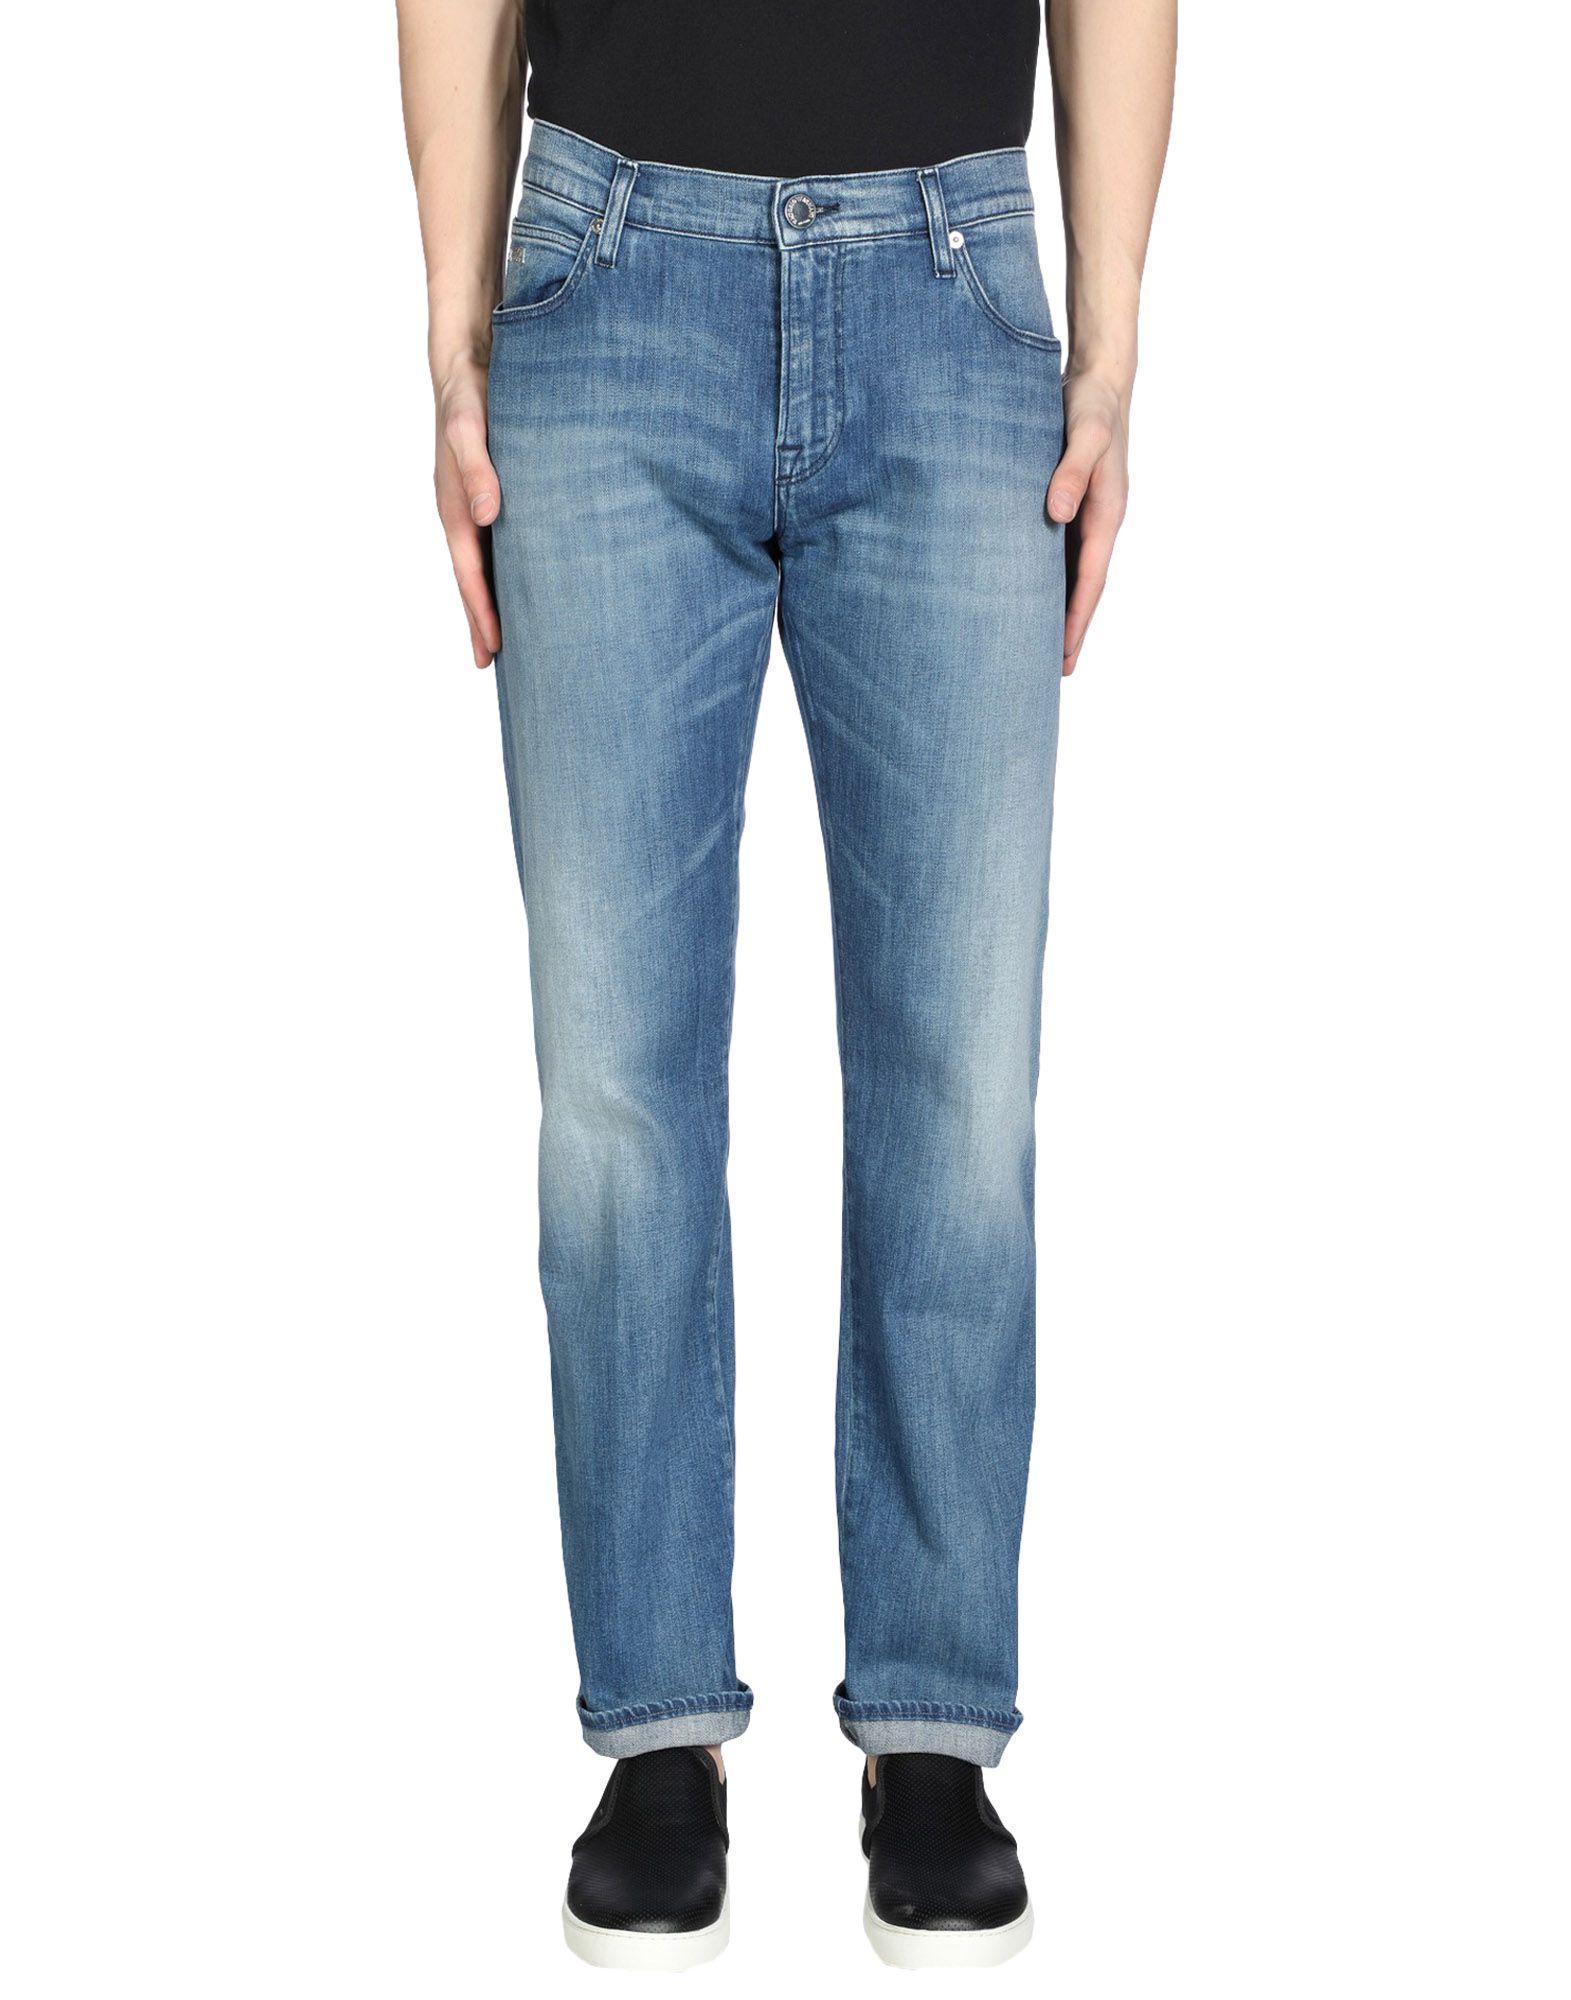 Emporio Armani Denim Pants In Blue